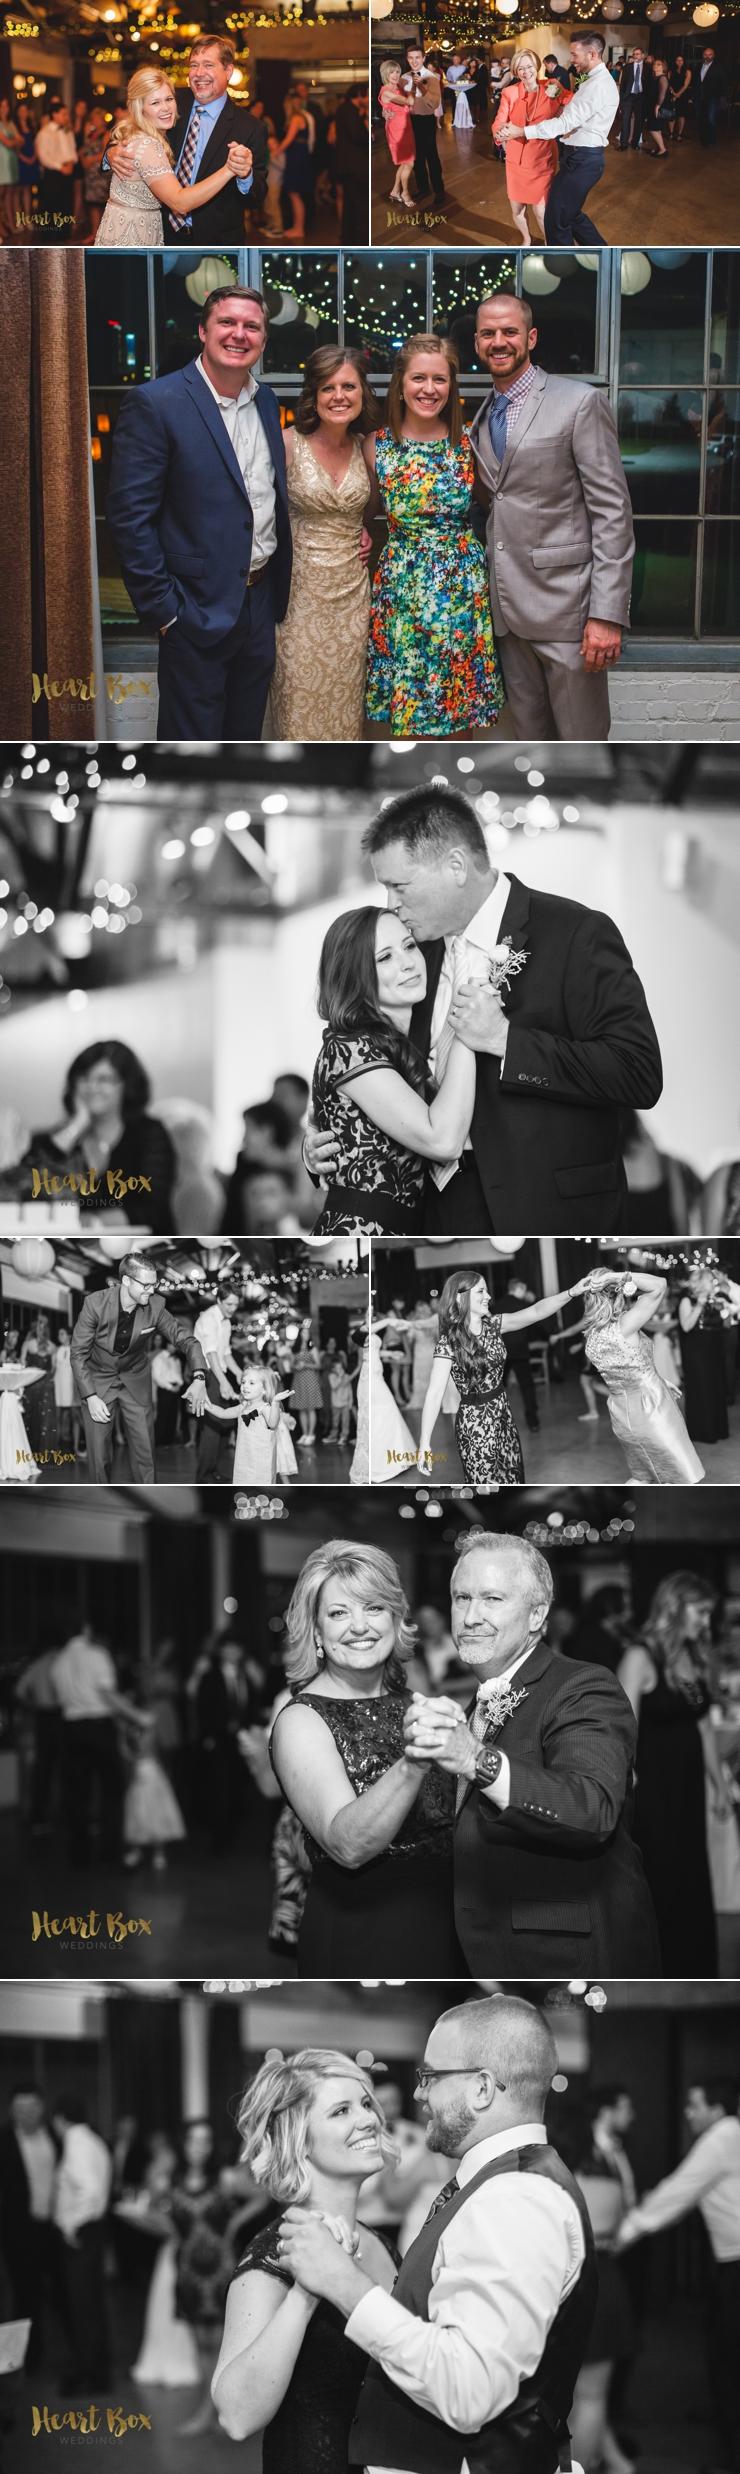 Mabry Wedding 23.jpg